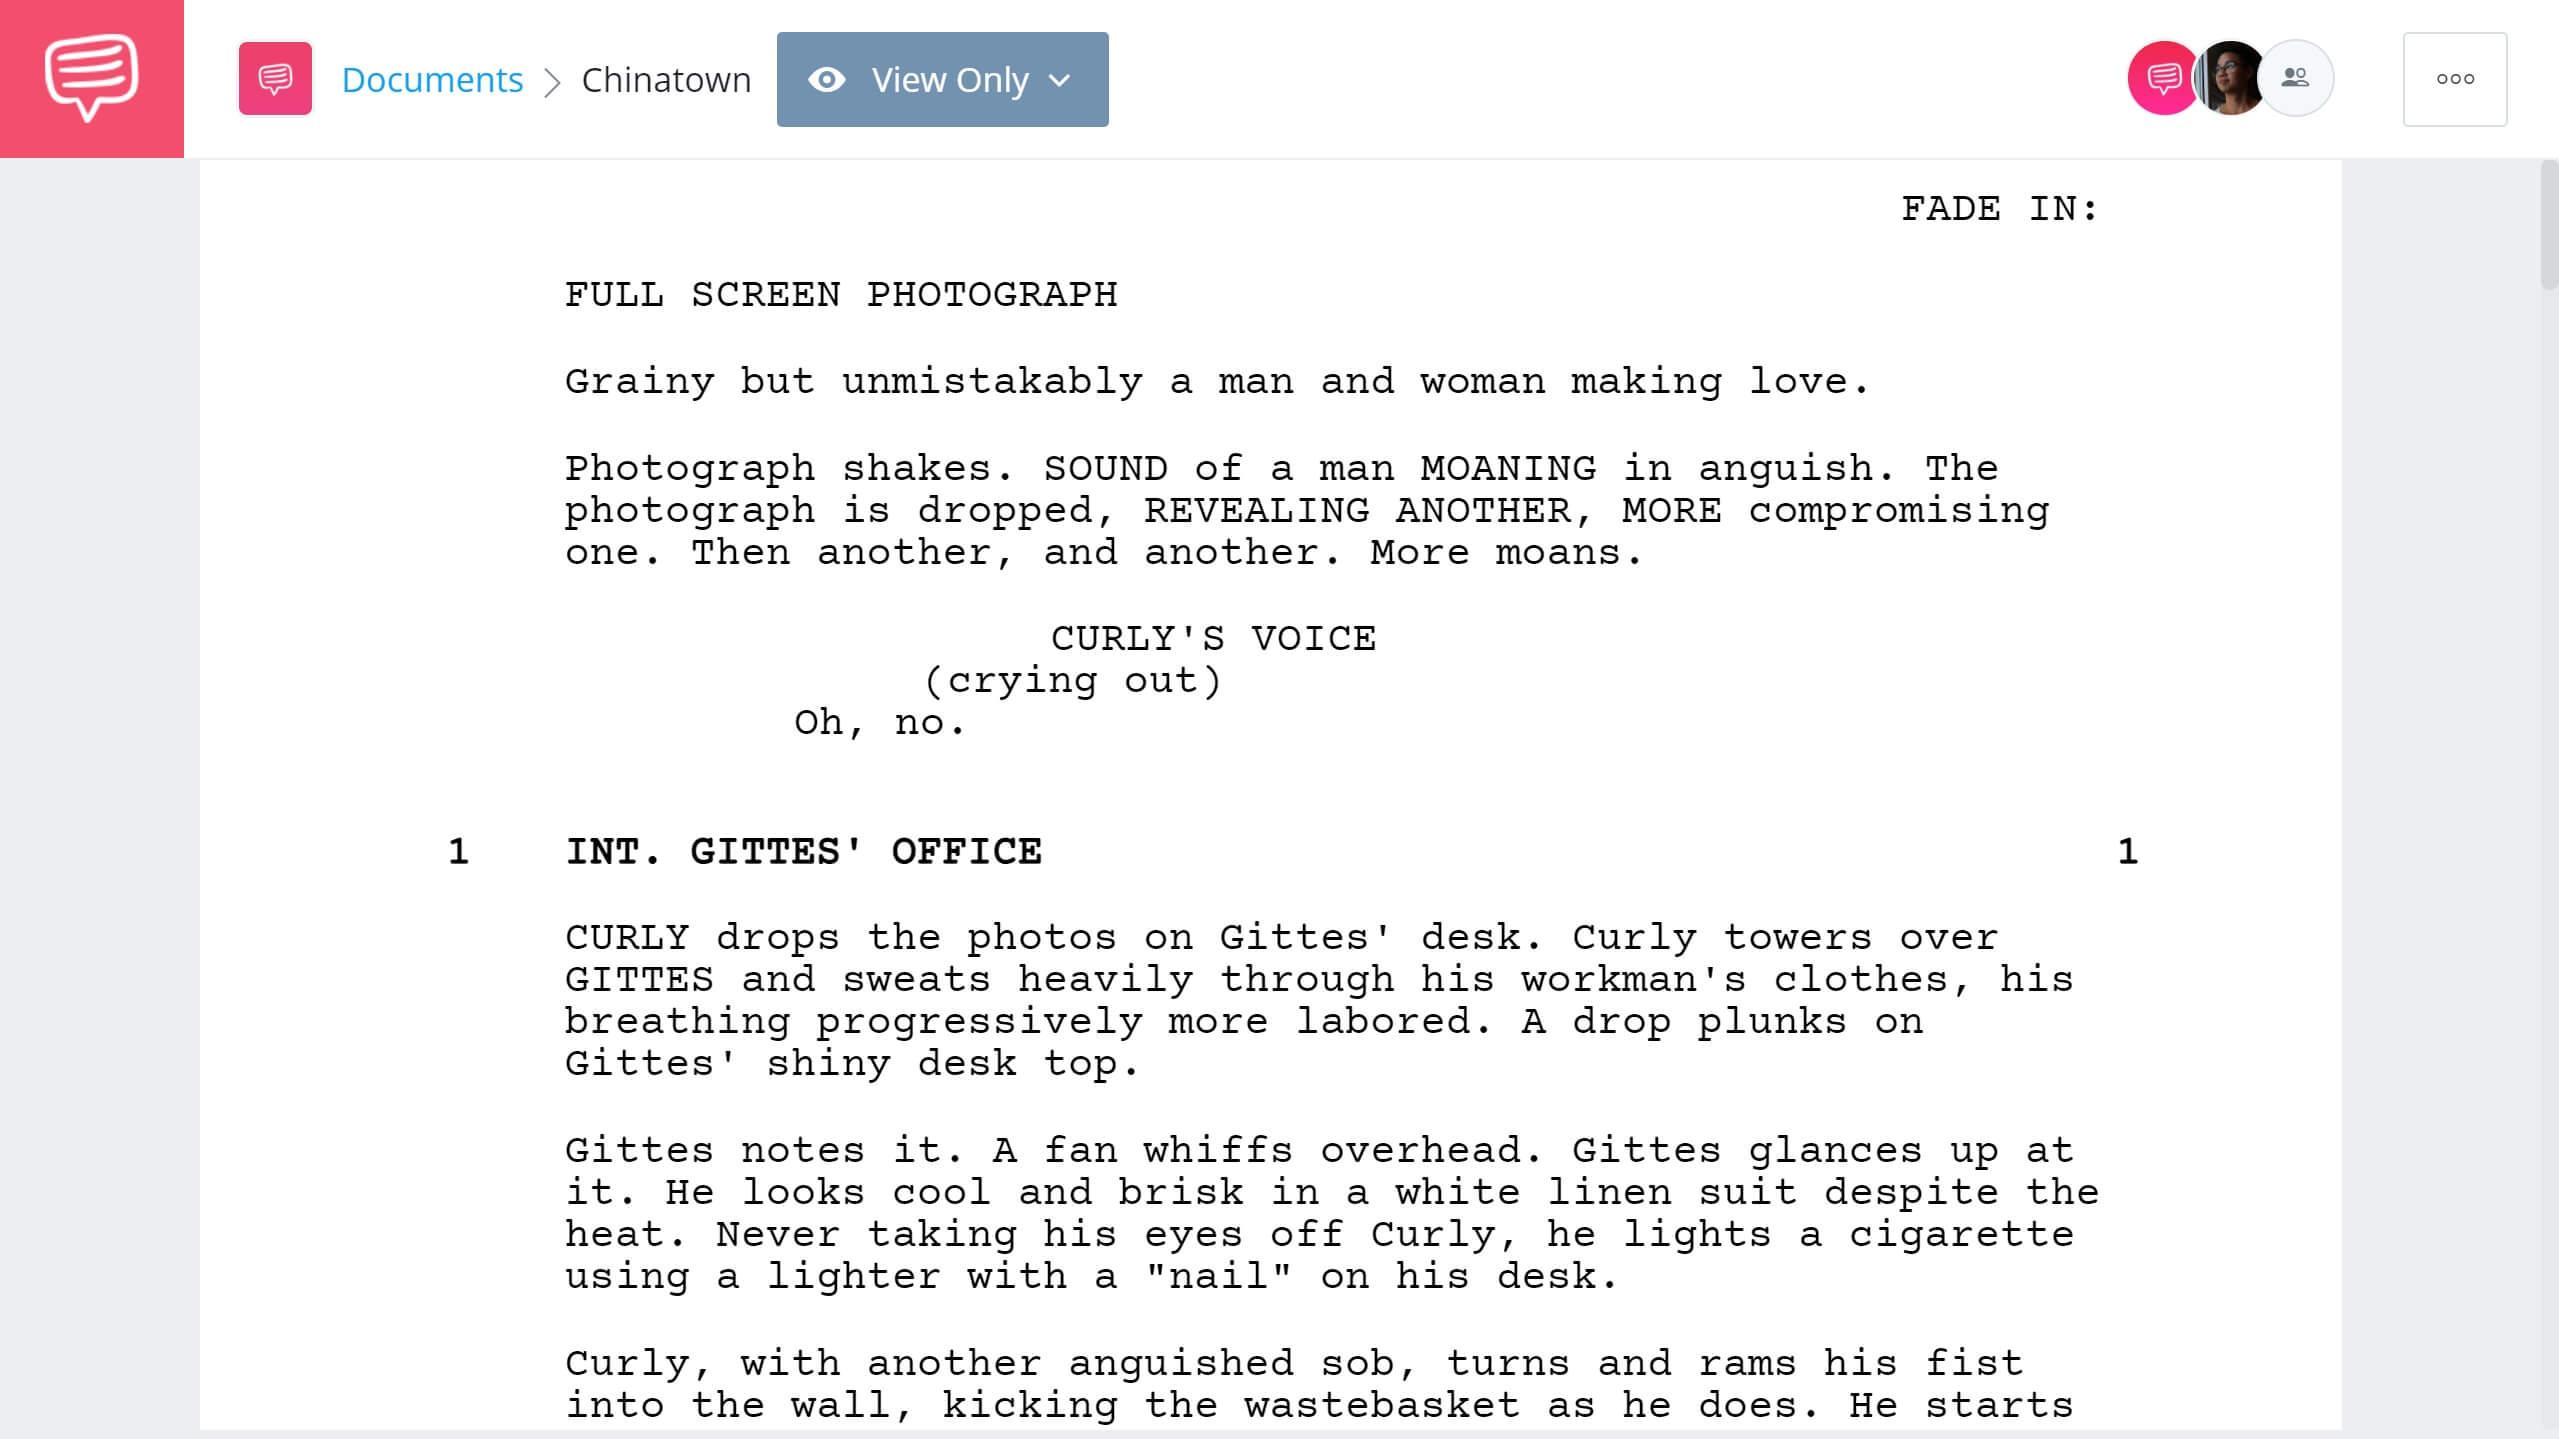 Best Original Screenplay Academy Award - Chinatown Full Script PDF Download - StudioBinder Screenwriting Software